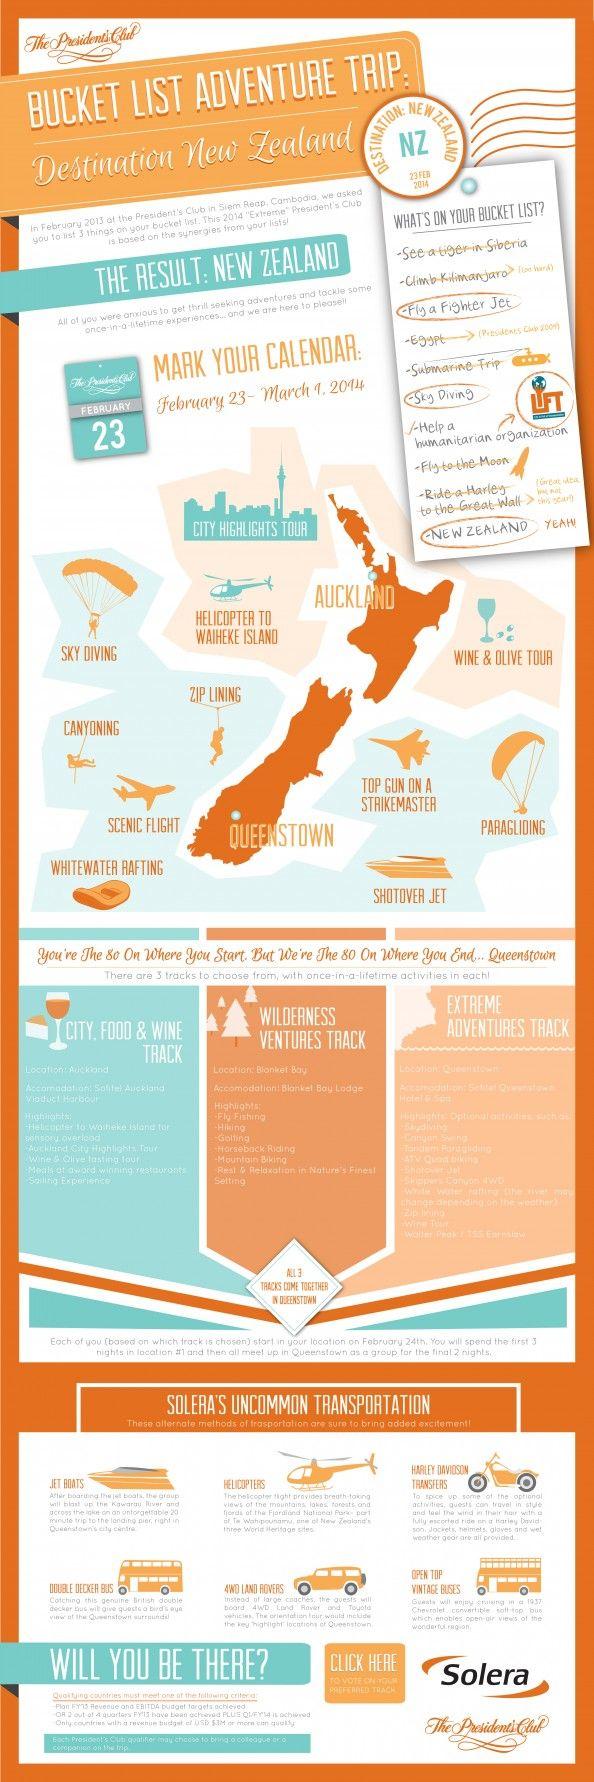 Bucket List Adventure Trip: New Zealand Infographic